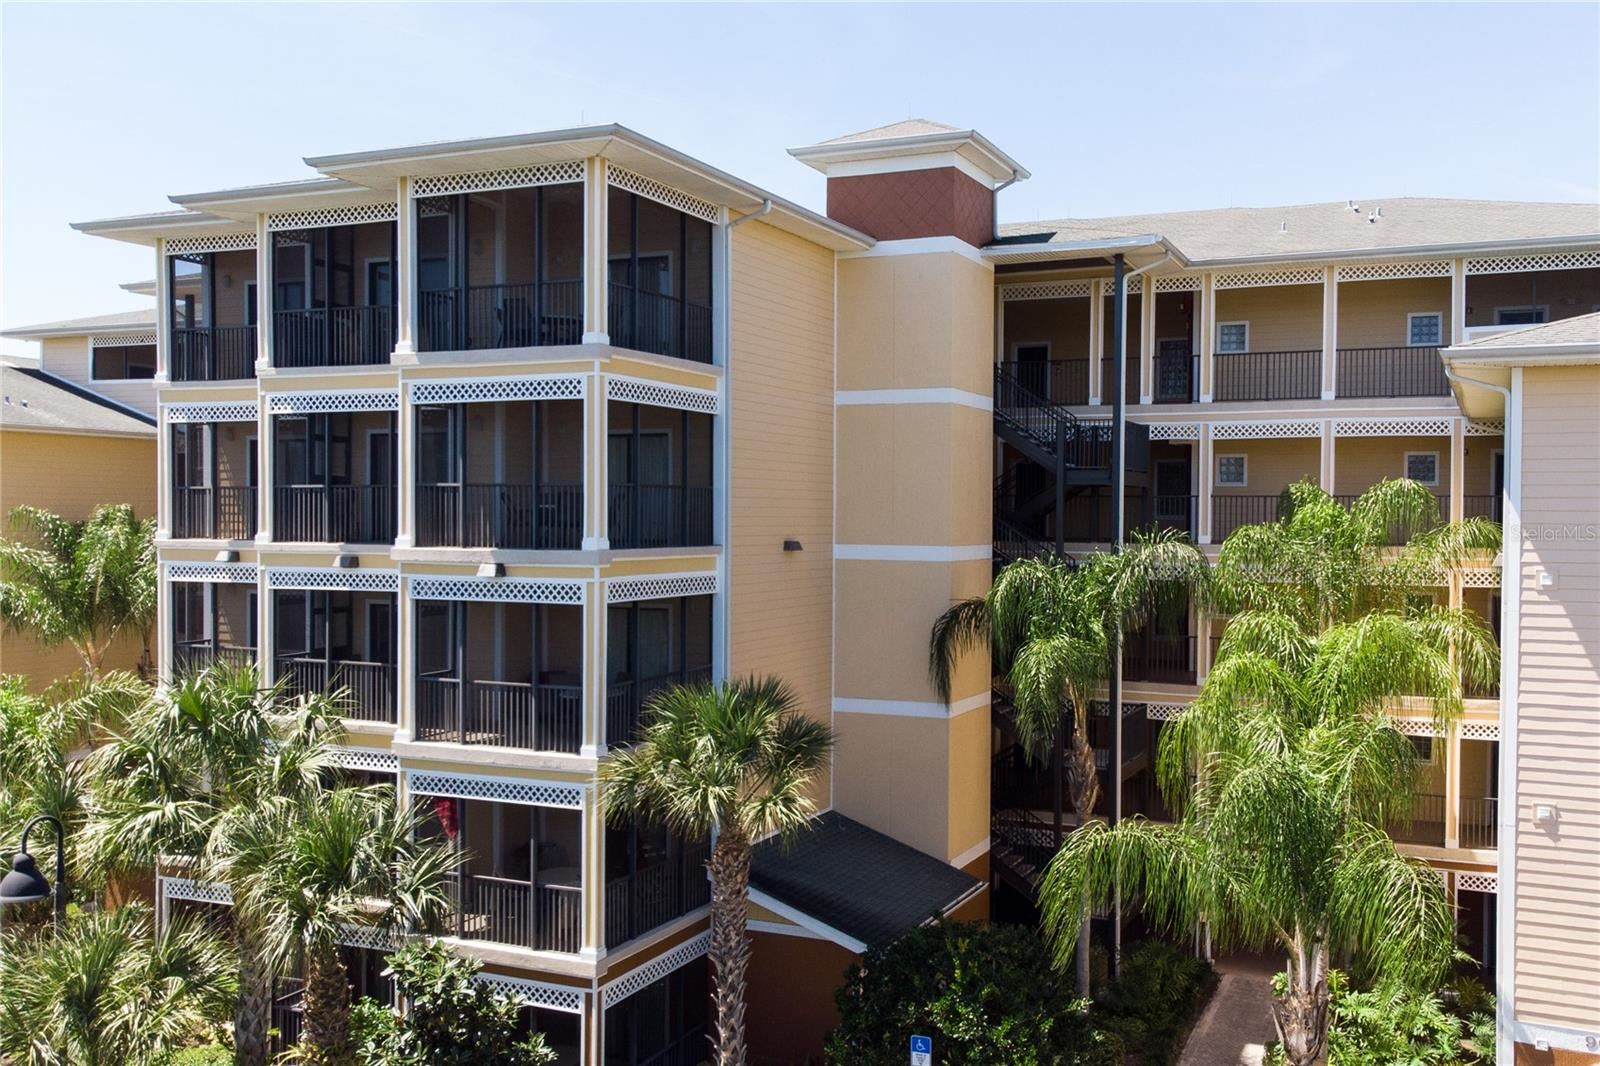 Photo of 9051 TREASURE TROVE LANE #304, KISSIMMEE, FL 34747 (MLS # S5056947)